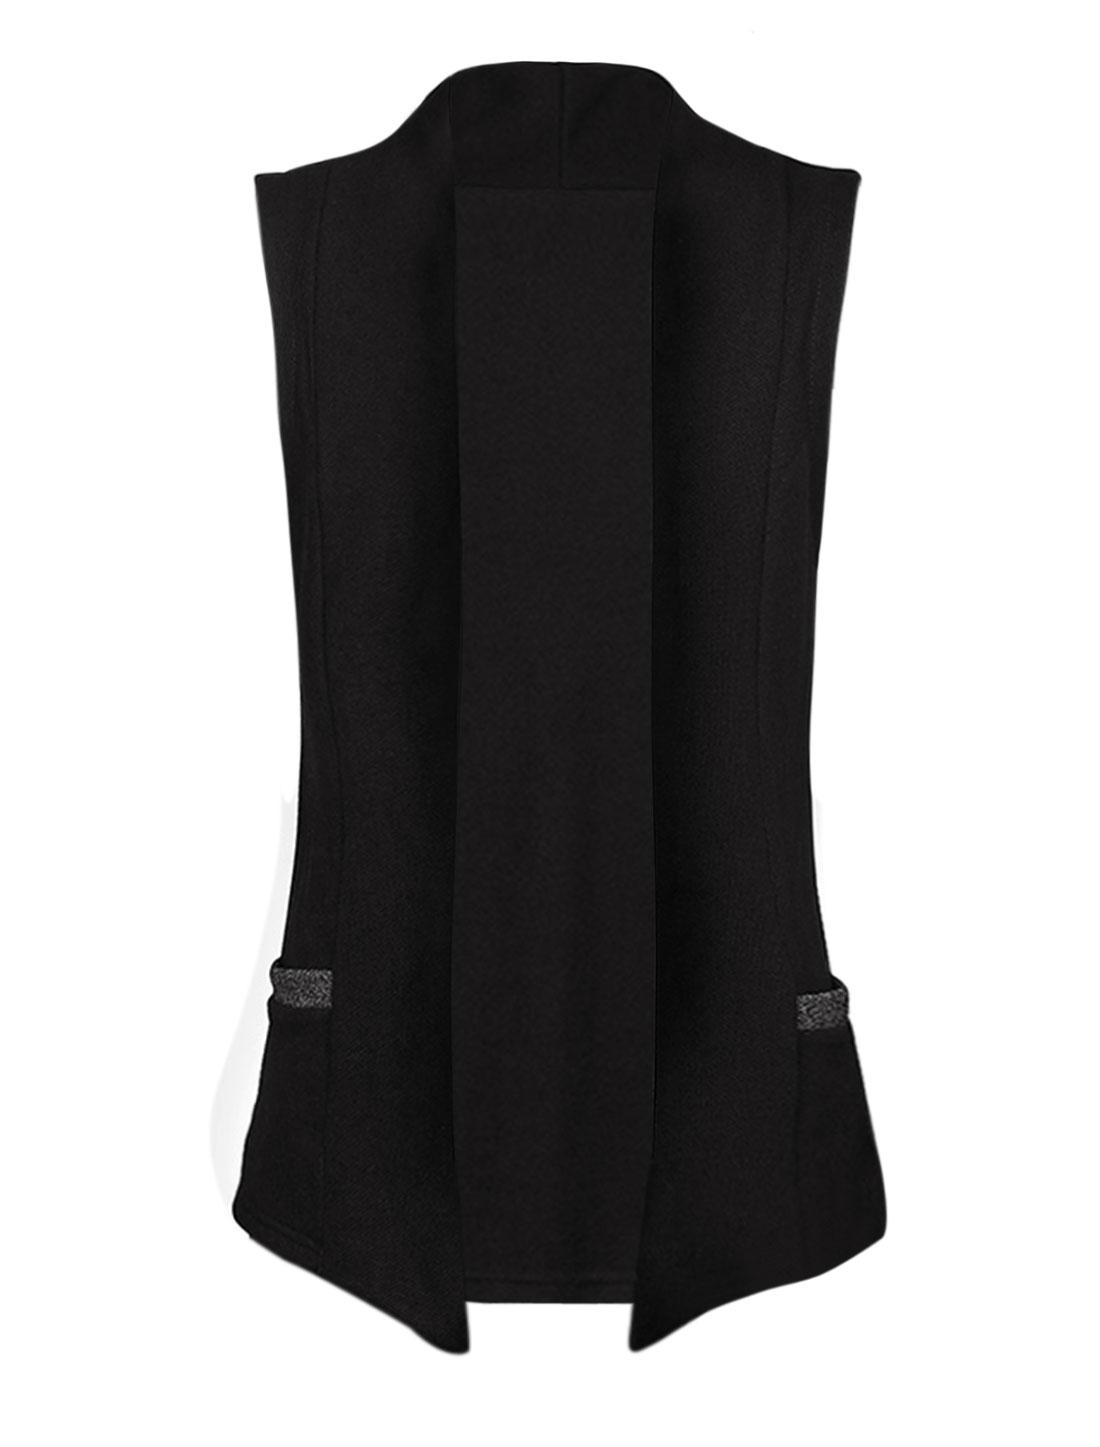 Men Open Front Two Straight Pockets Sleeveless Vest Outerwear Black S